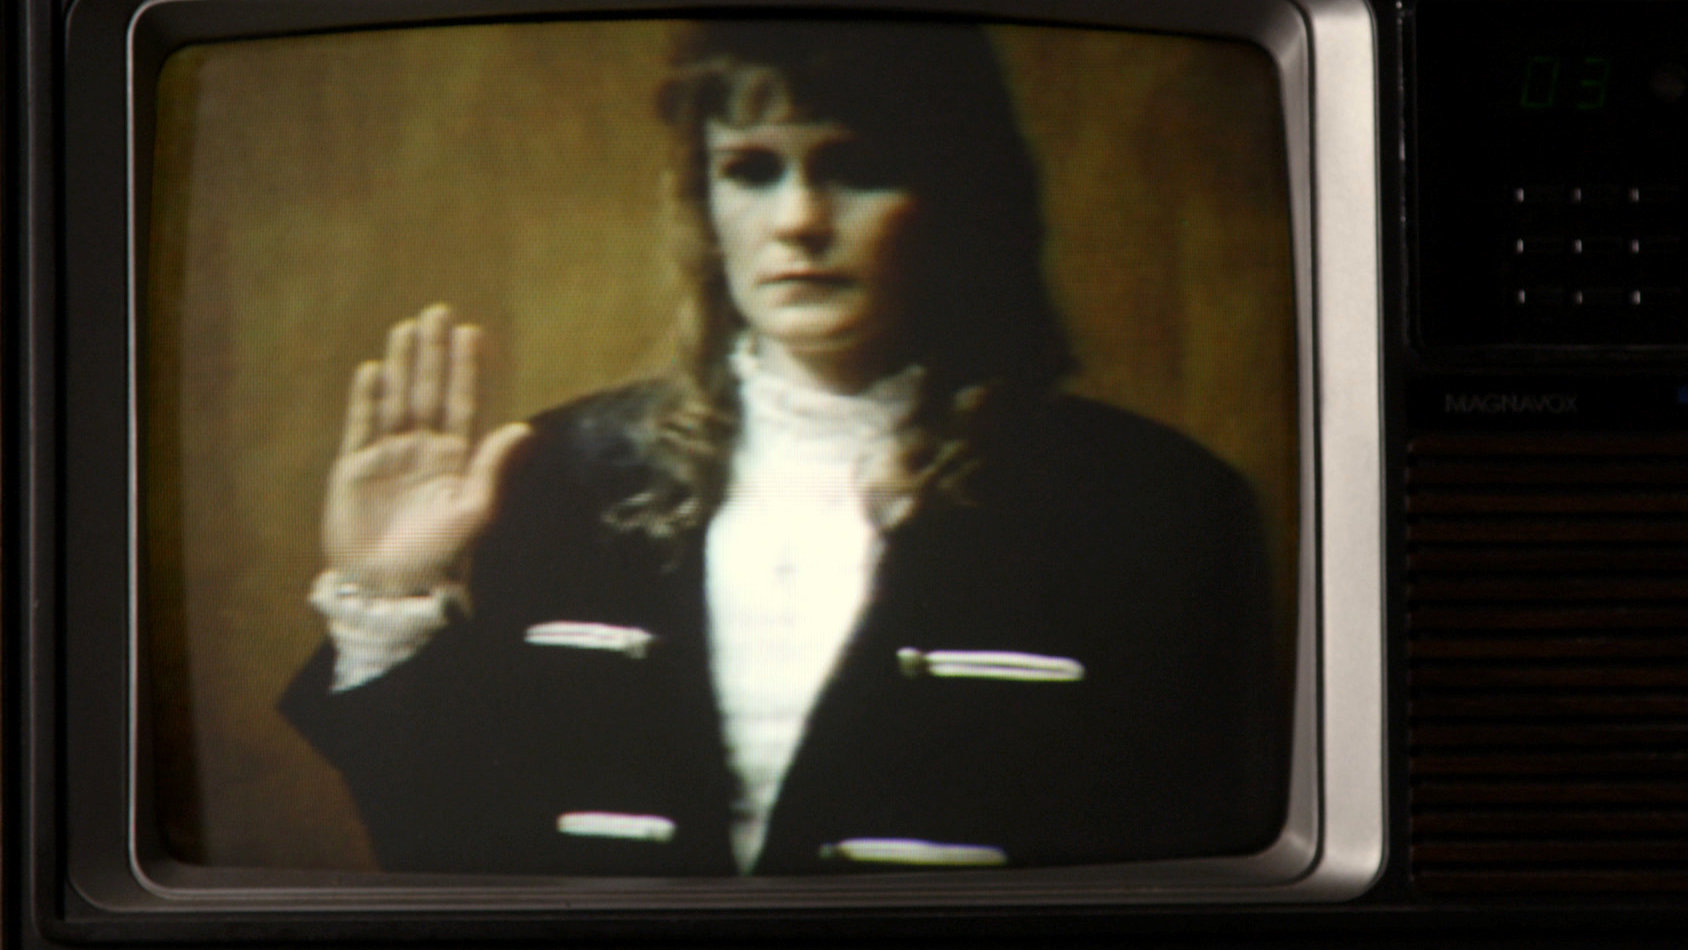 IDFA tip Captivated: The Trials of Pamela Smart